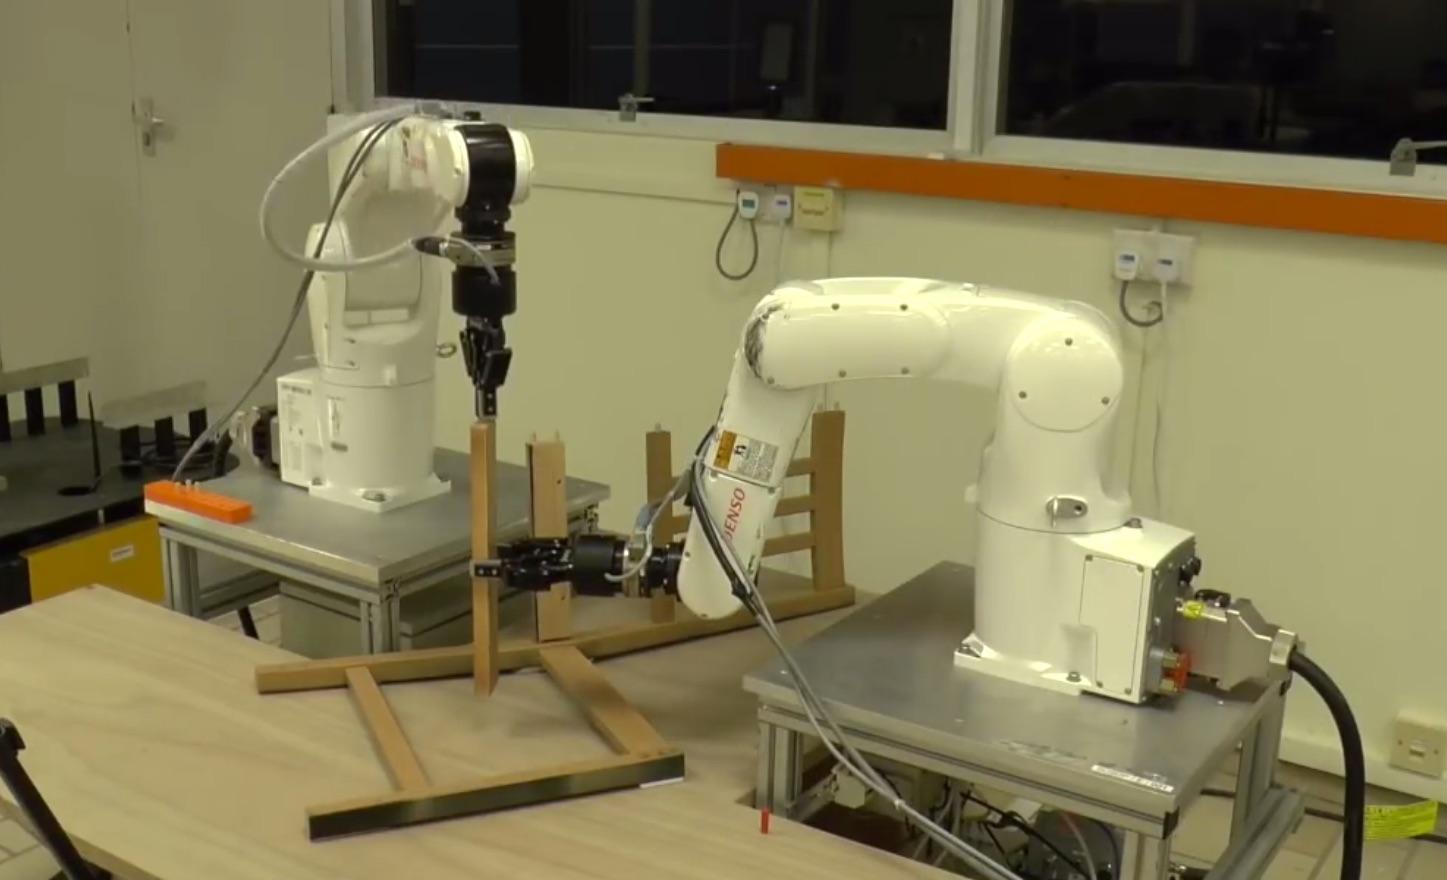 Watch Robots Attempt to Assemble Ikea Furniture